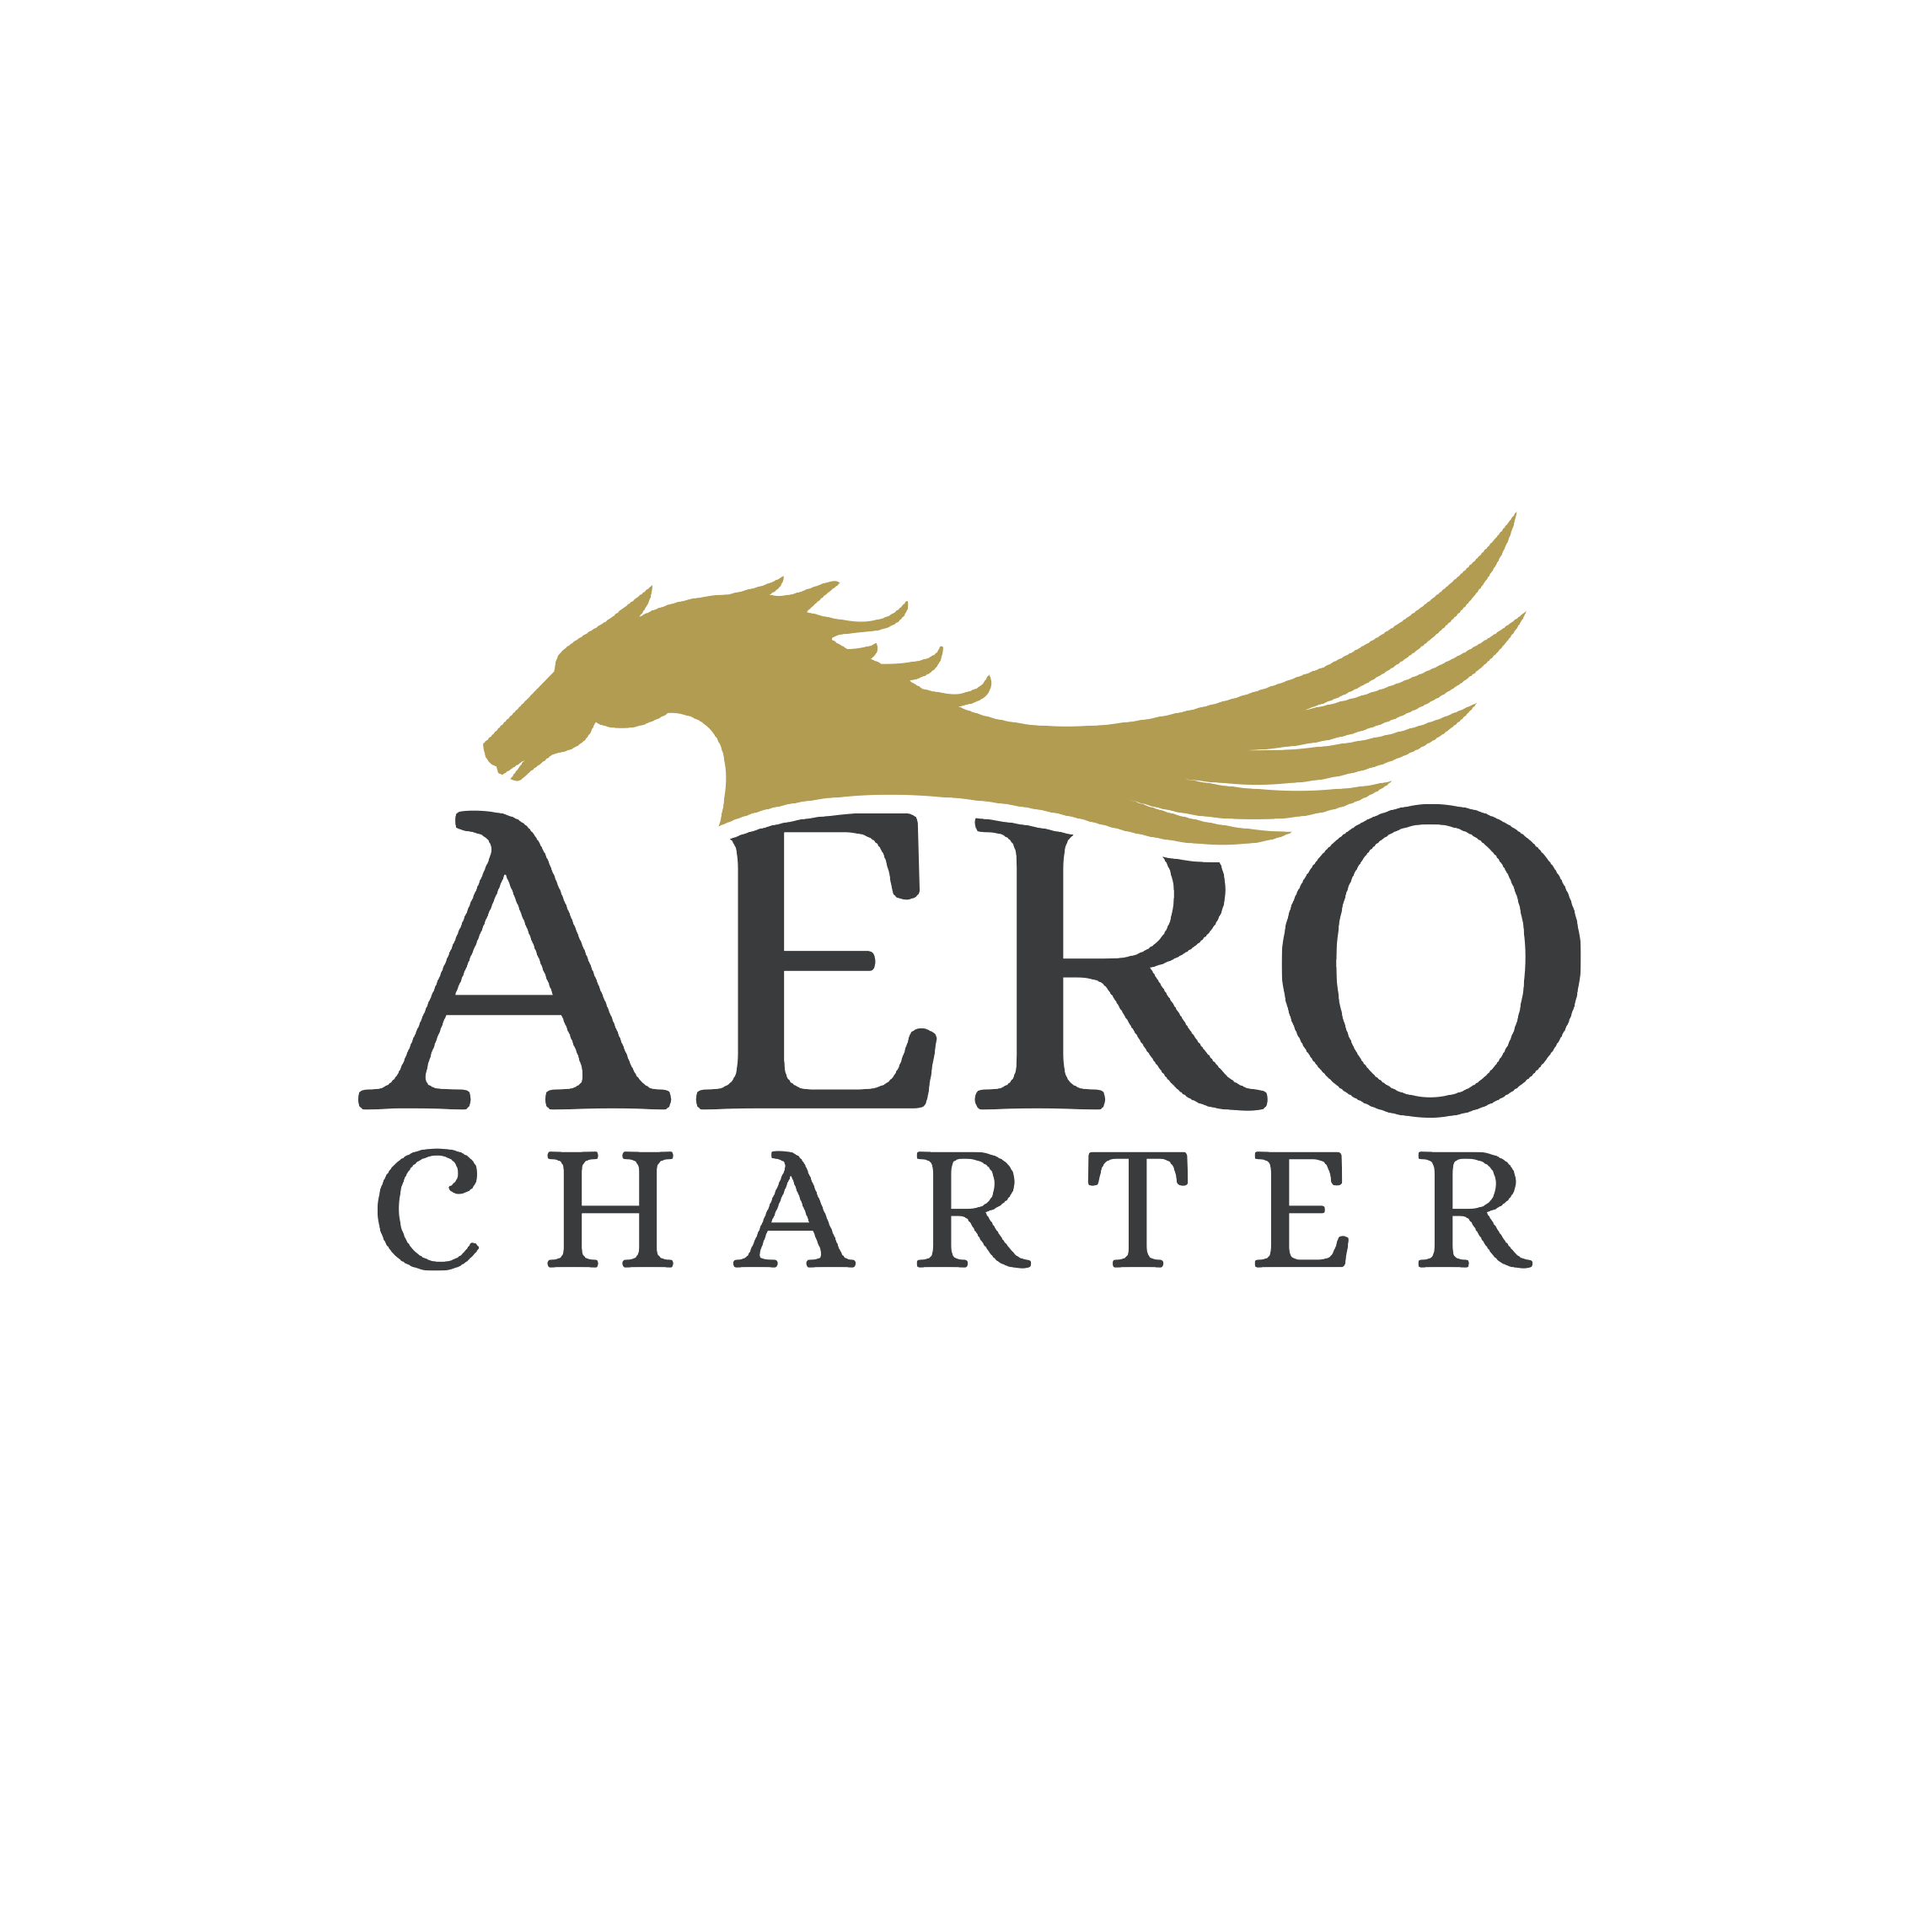 Aero Charter